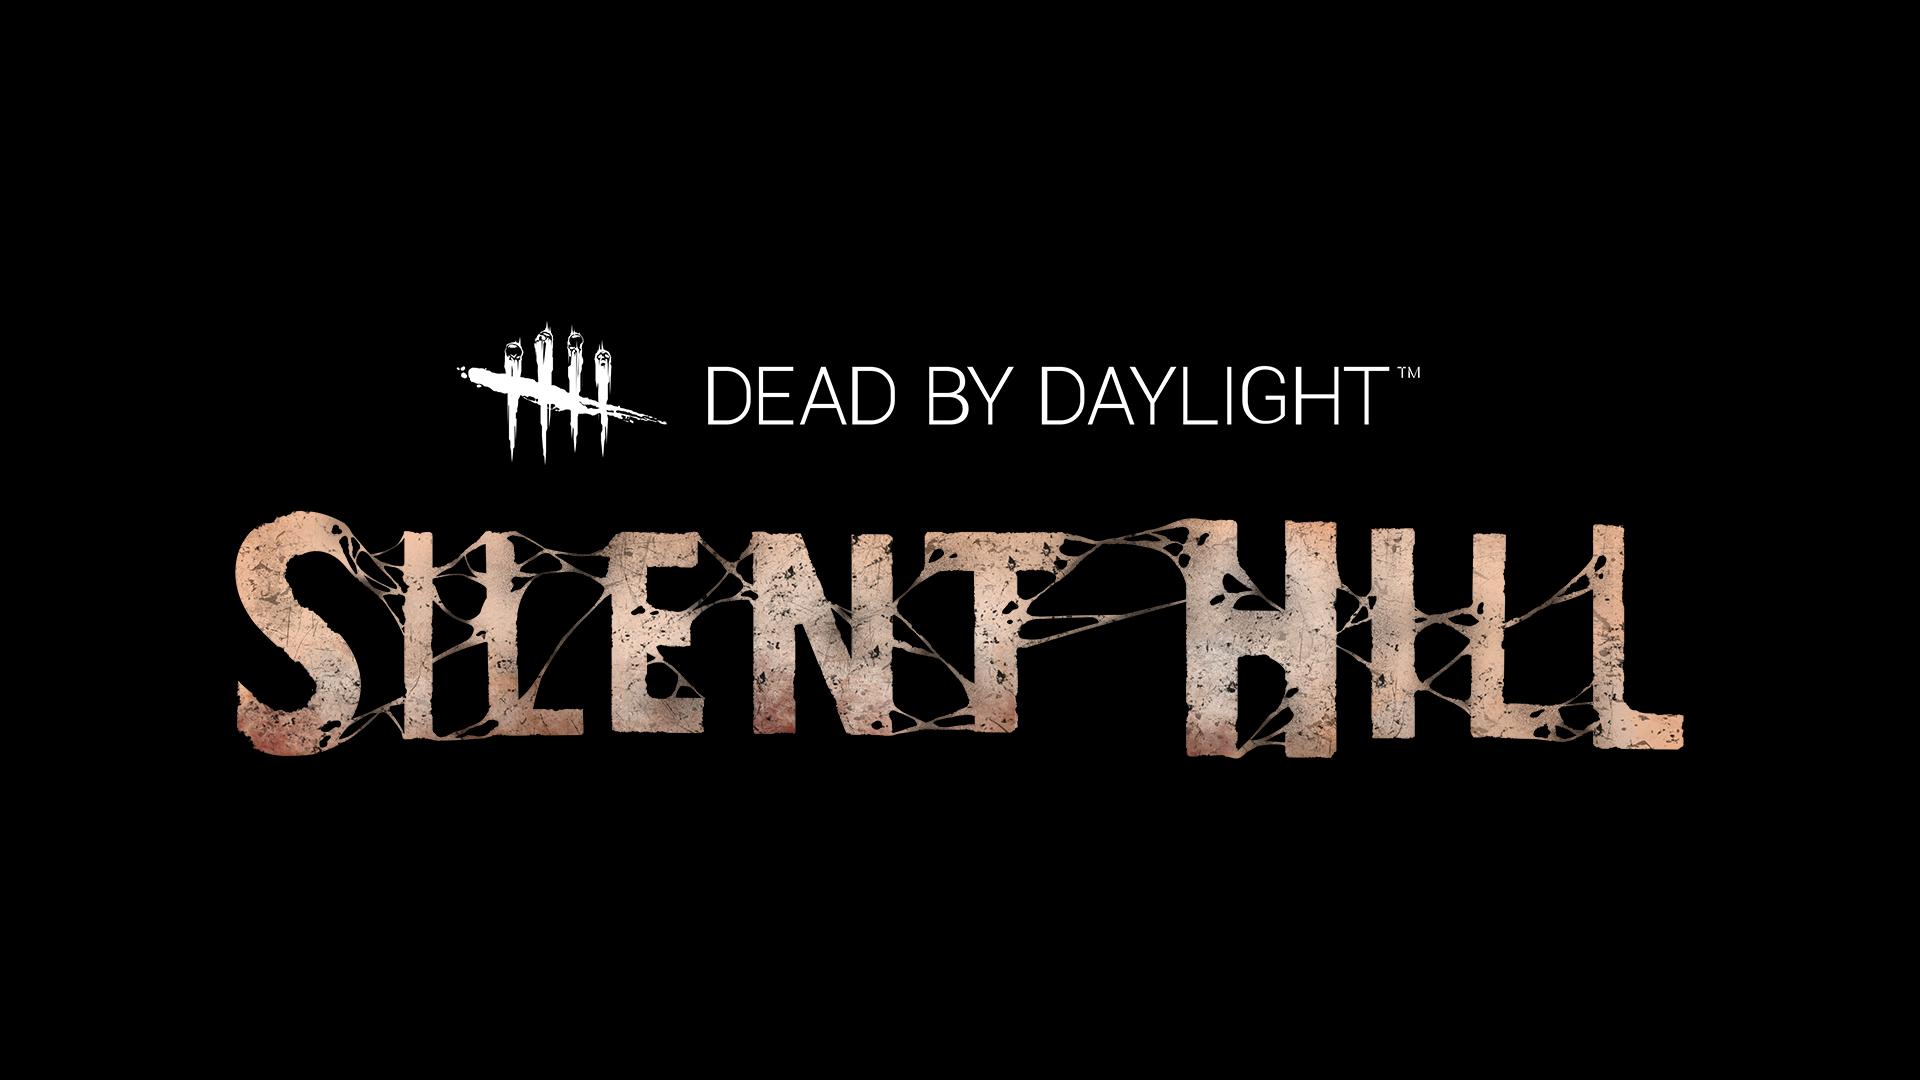 فصل سایلنت هیل بازی Day By Daylight